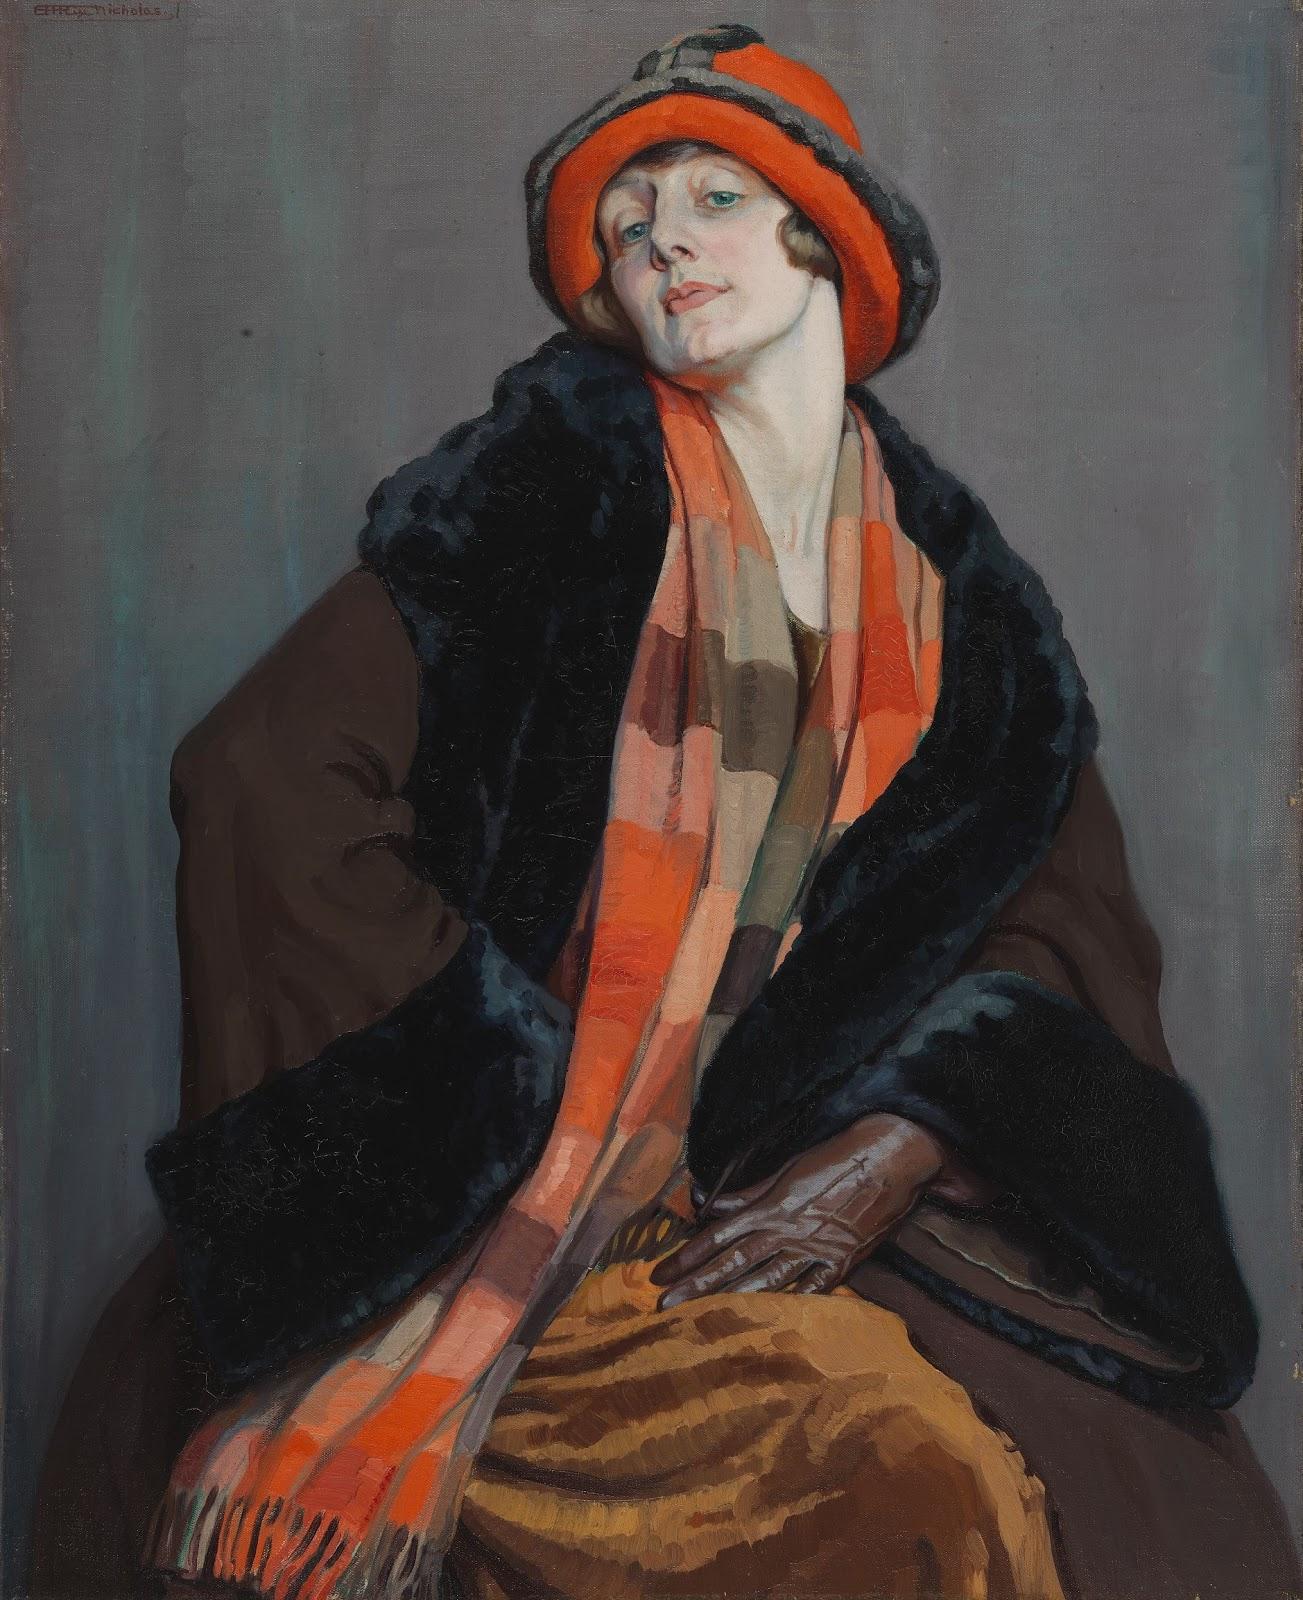 Hilda Rix Nicholas Une Australienne National Gallery of Australia